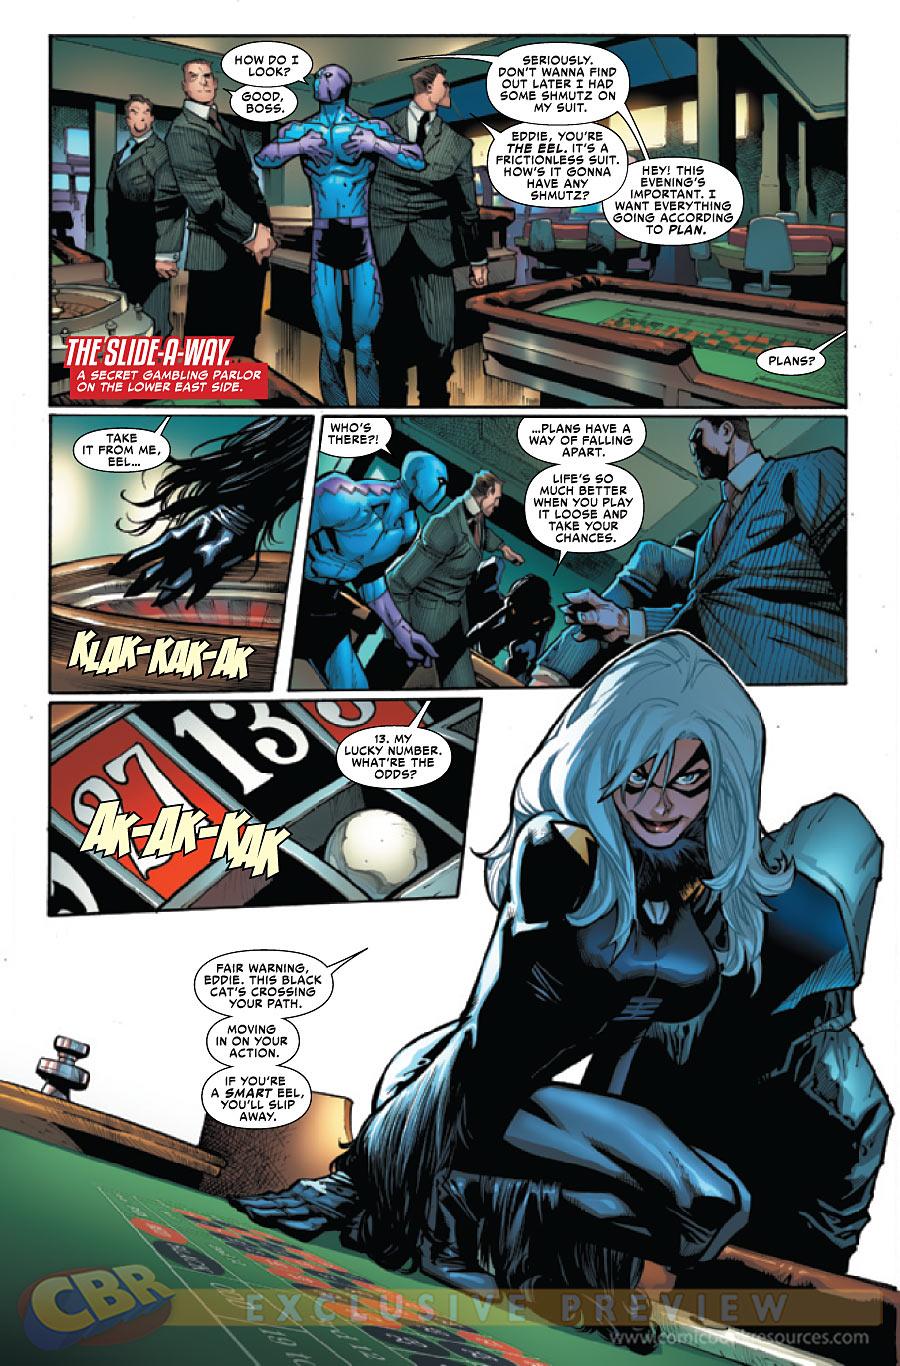 Amazing Spider-Man (2014) #5: Andrewroebuck's Take